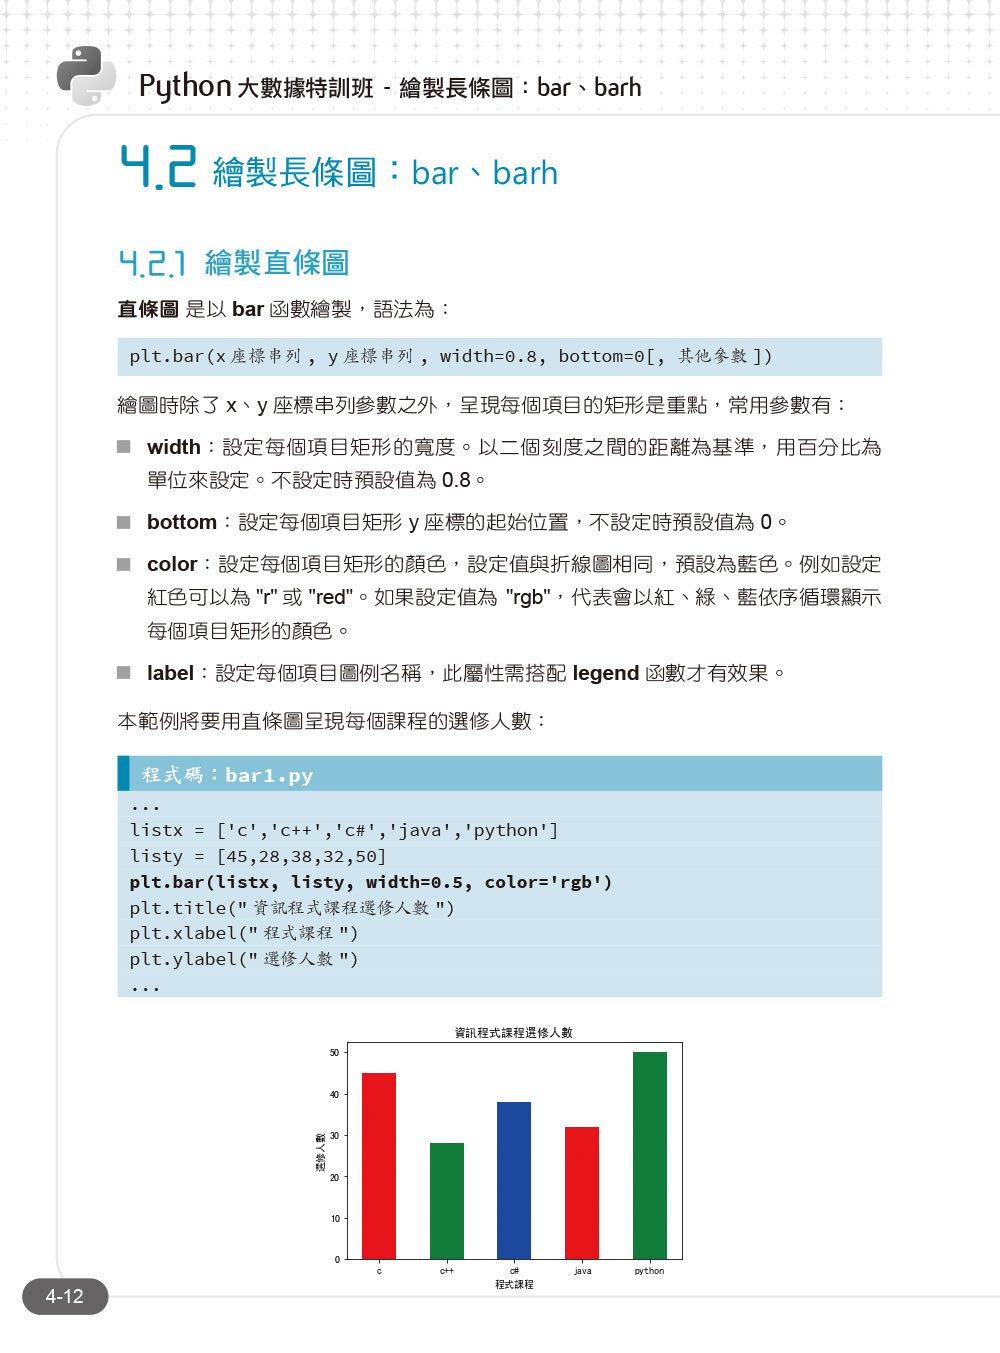 Python 大數據特訓班:資料自動化收集、整理、清洗、儲存、分析與應用實戰, 2/e (附300分鐘影音教學/範例程式)-preview-4